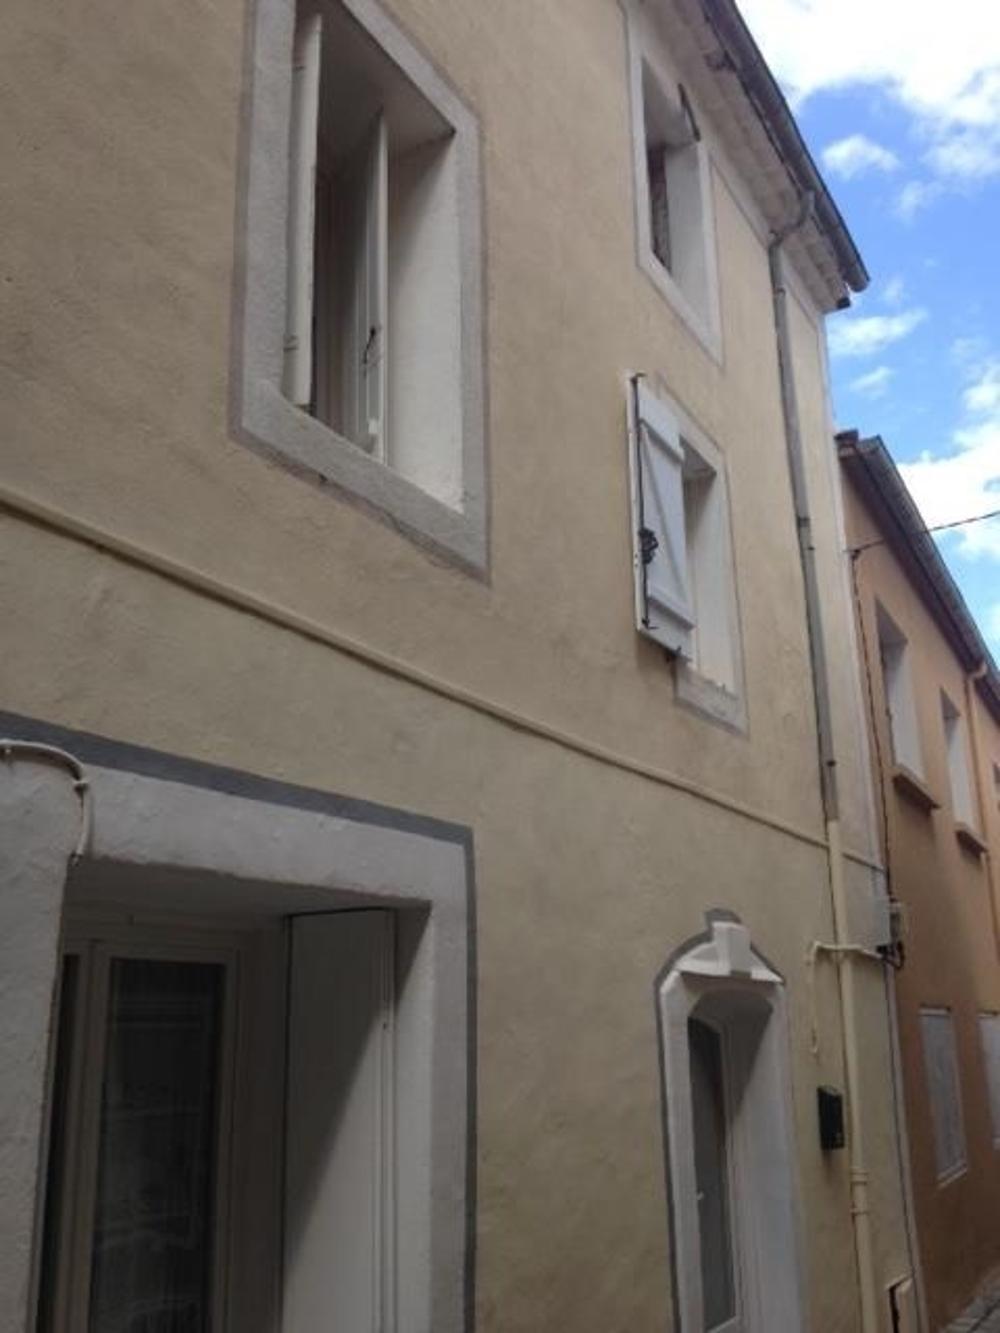 Pinet Hérault dorpshuis foto 3617859